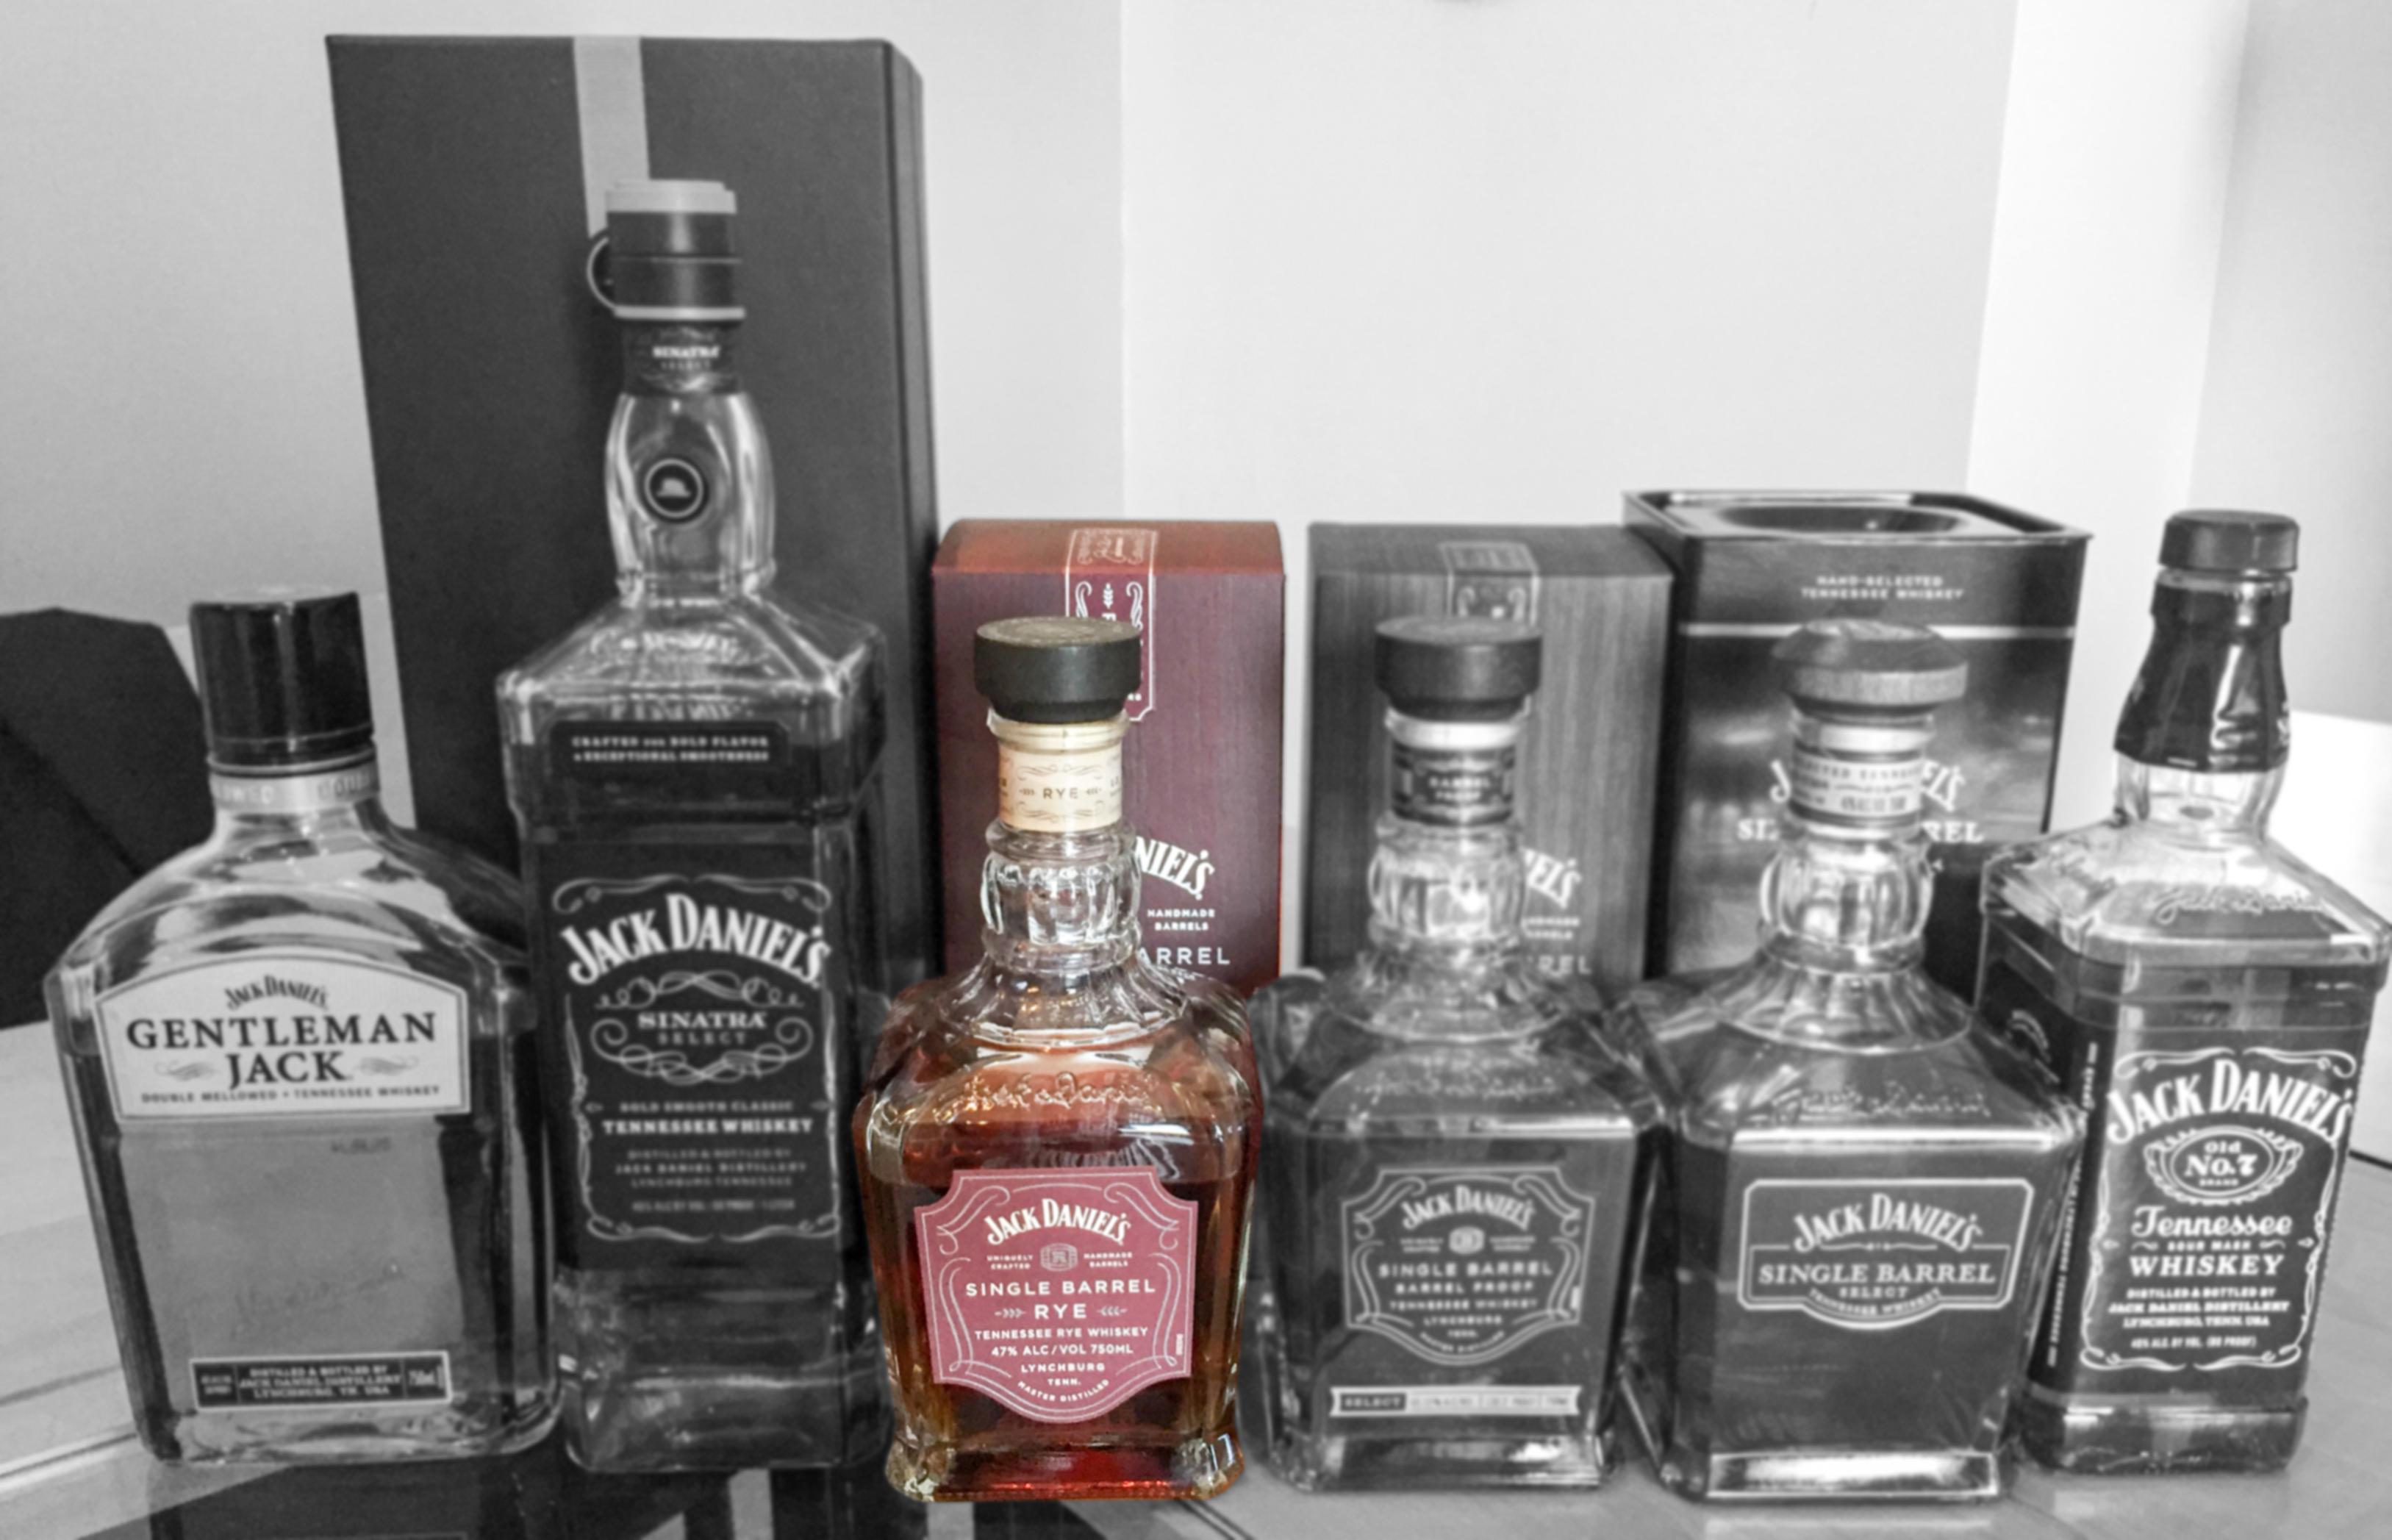 Jack Daniels Single Barrel Rye Boozist